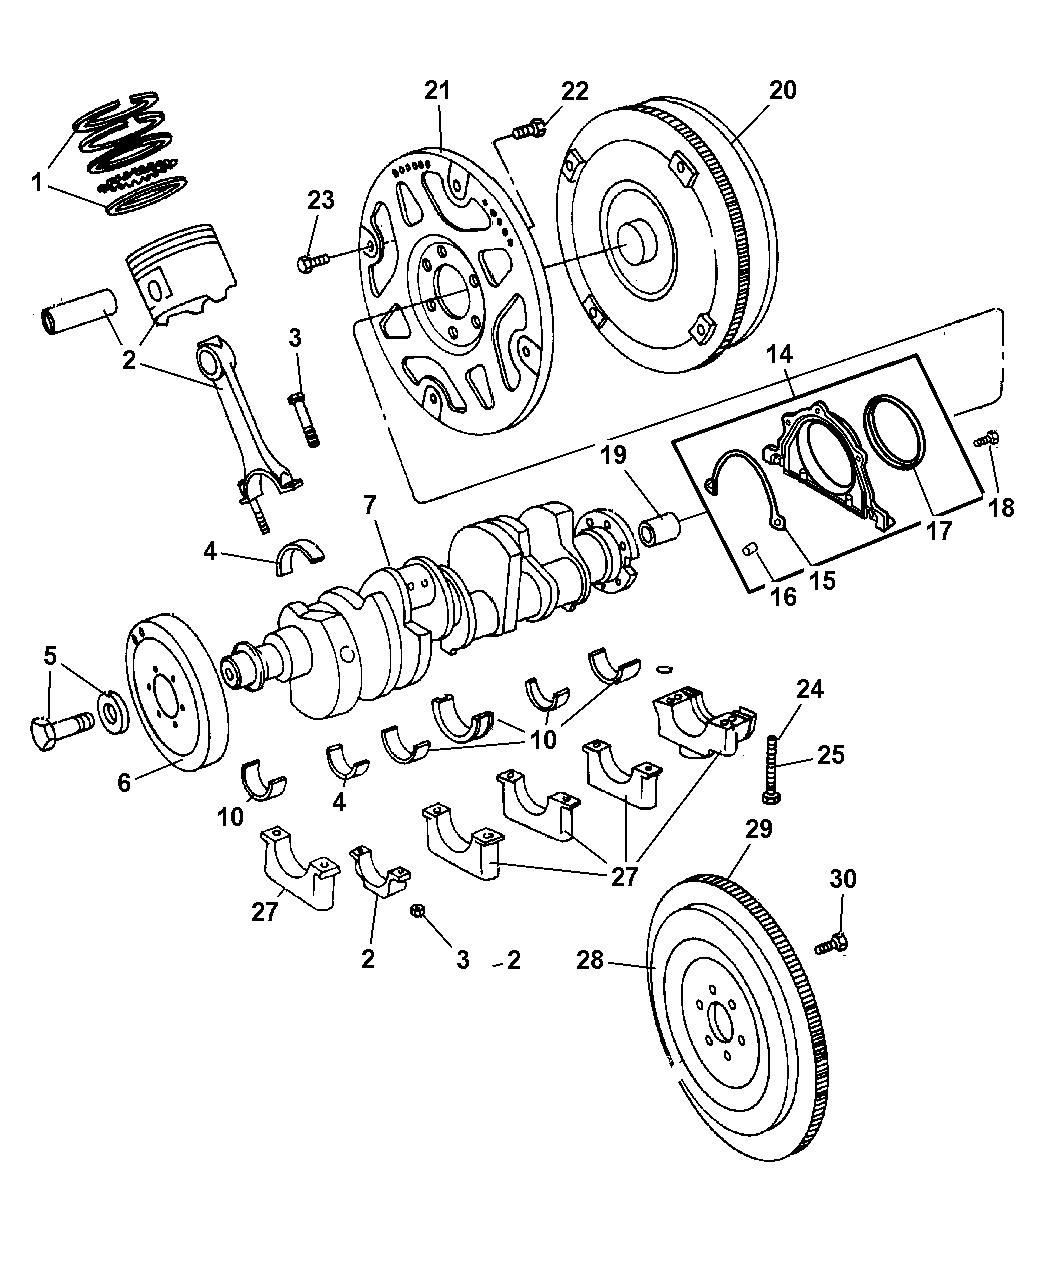 Resource T D Amp S L Amp R Ab C Ee C F Eab D Ee D Ffed A E D A Fc on 2006 Dodge Ram 5 7 Engine Diagram